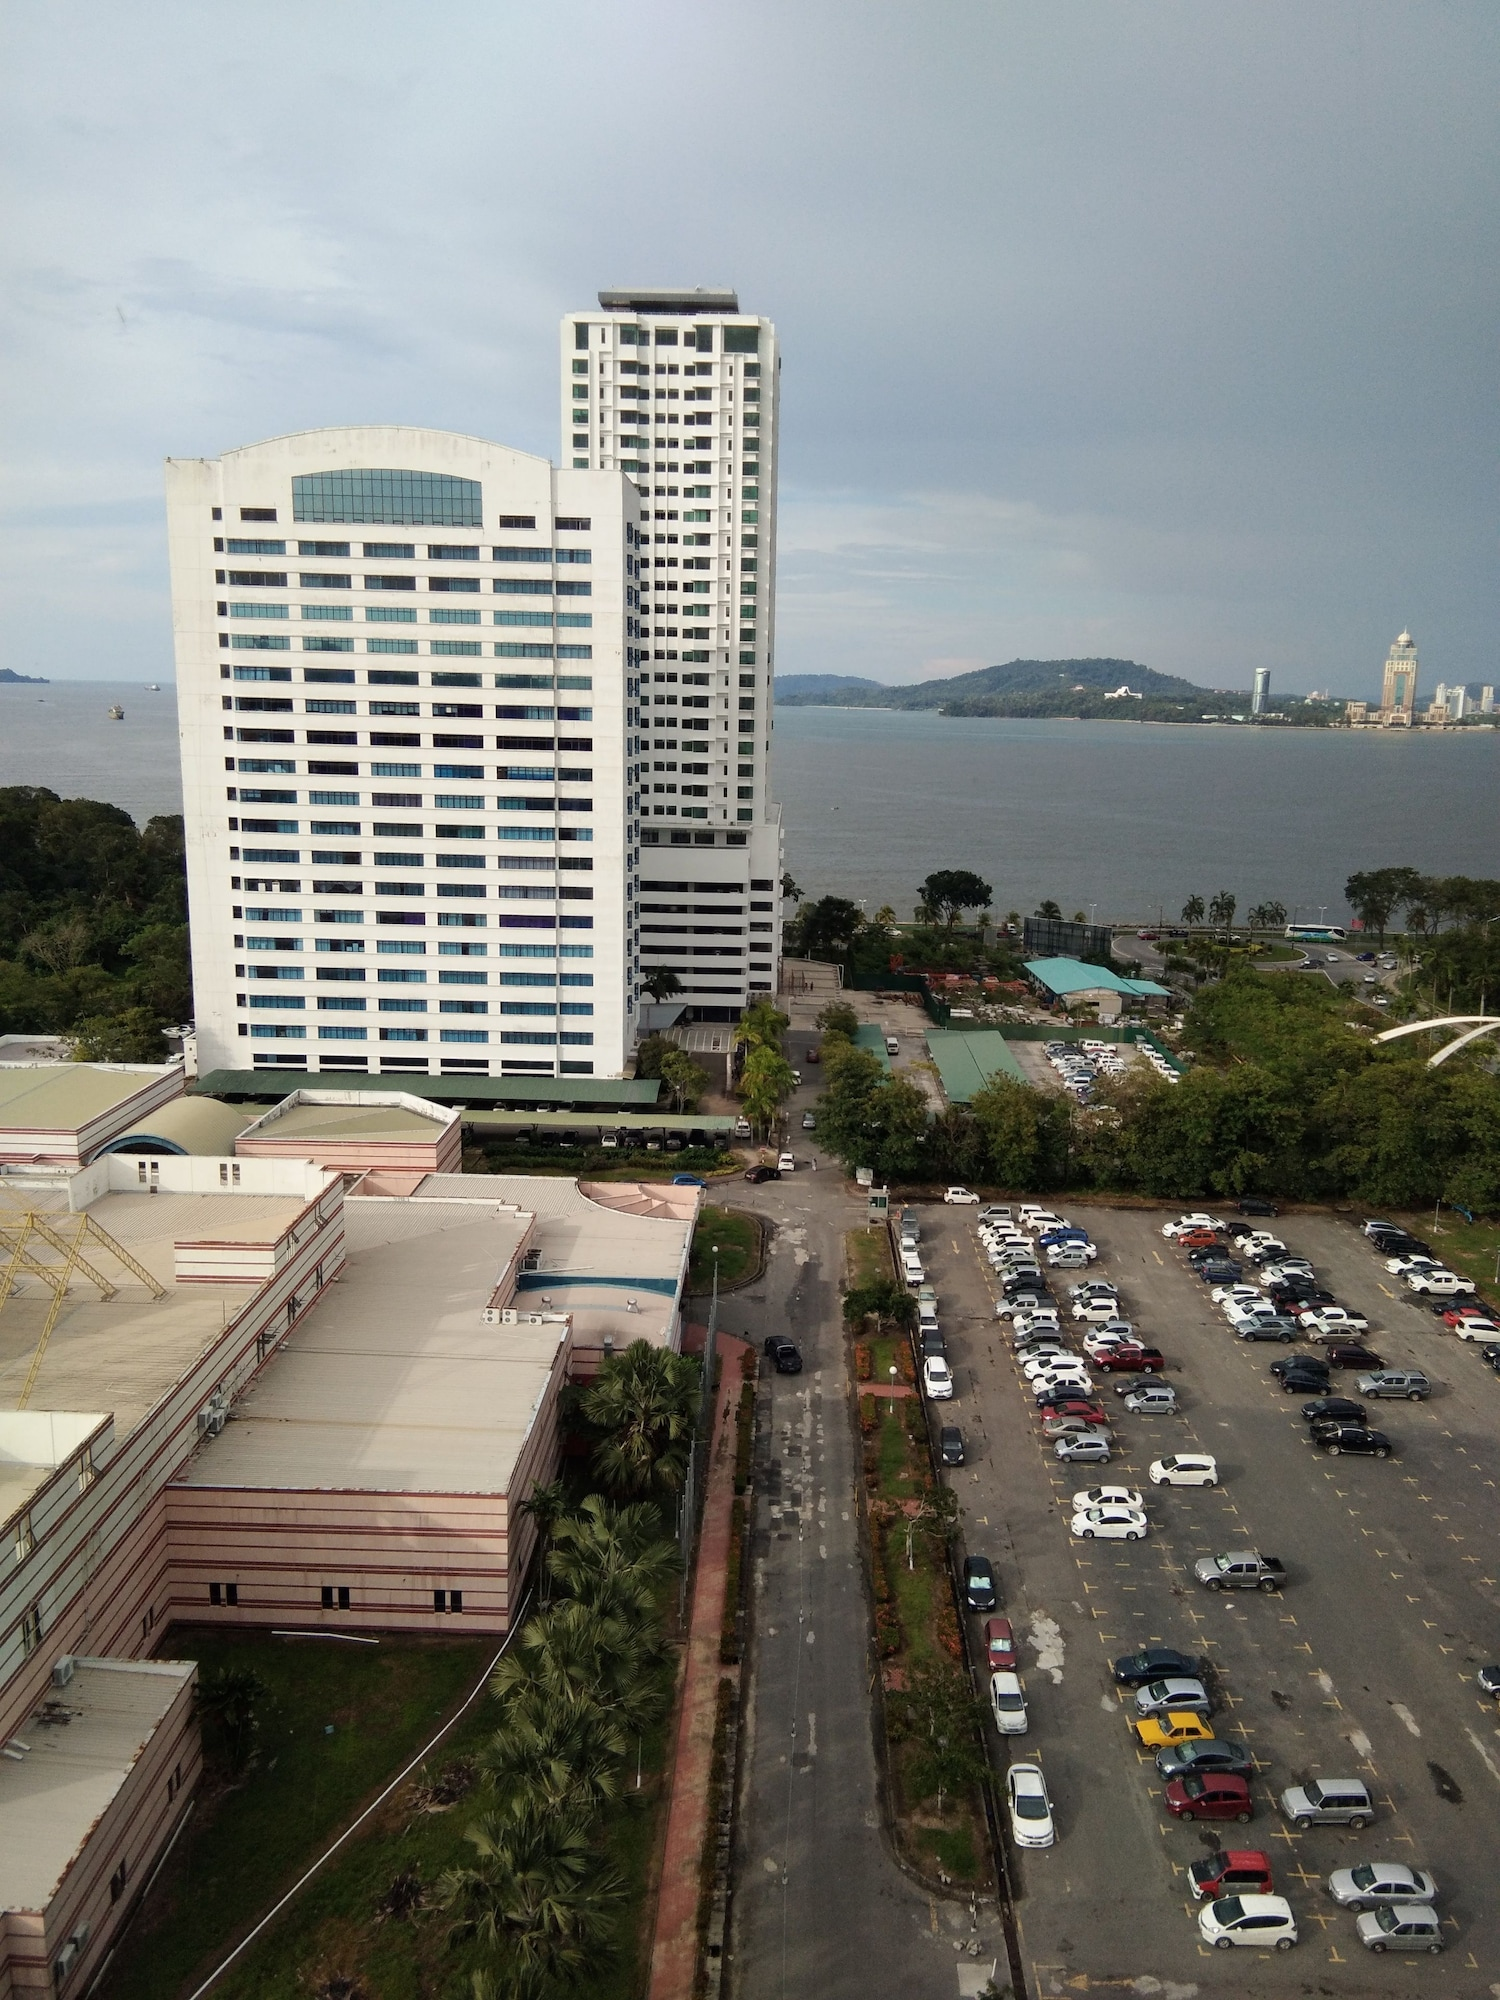 Likas Deluxe 3 Bedroom Apartment, Kota Kinabalu